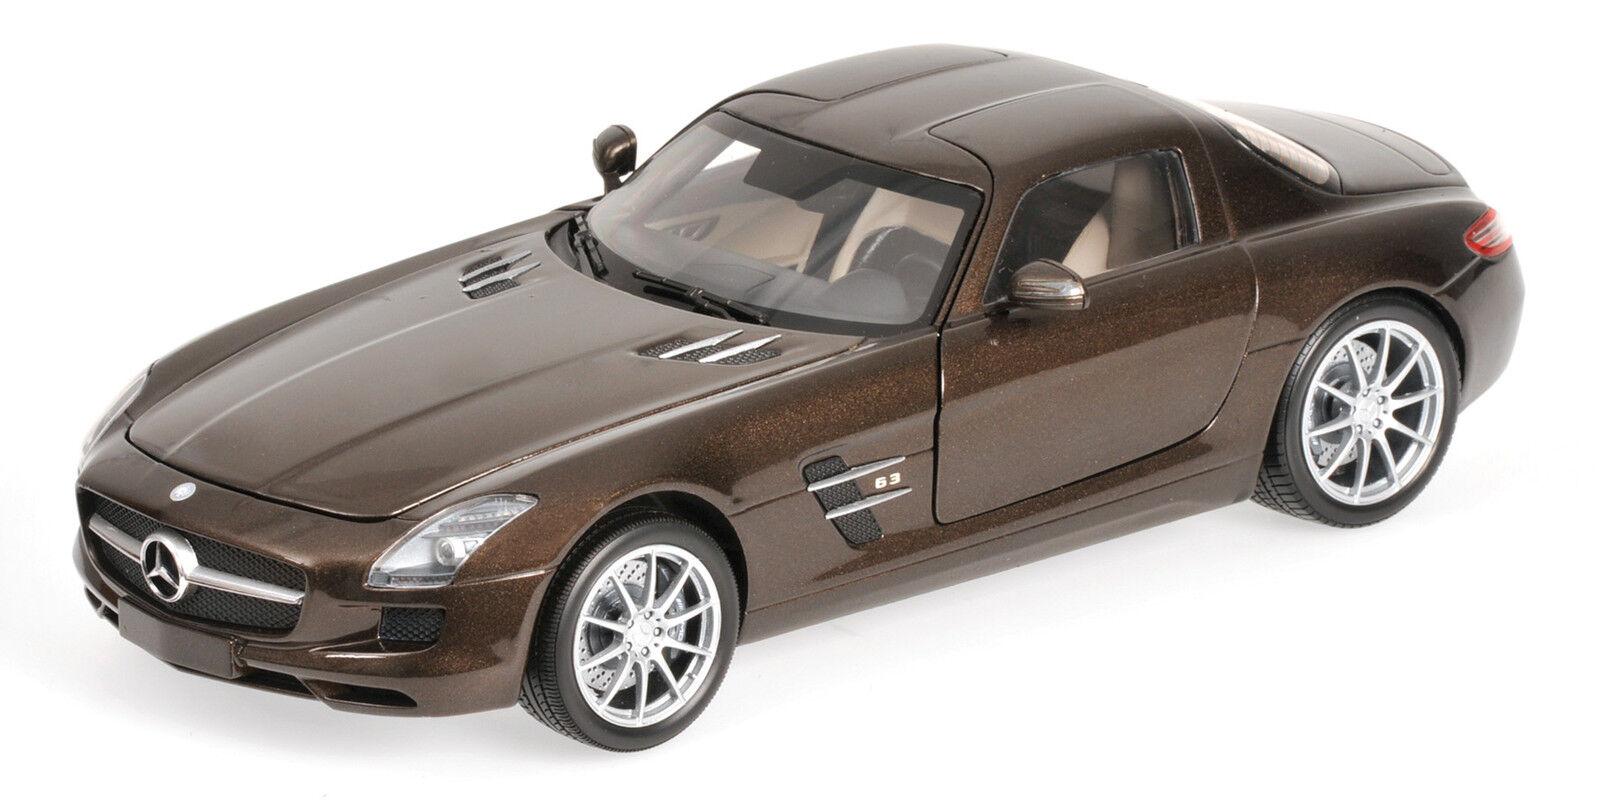 Minichamps Mercedes-Benz SLS AMG 2010 1 18 metallic marron (MCC)